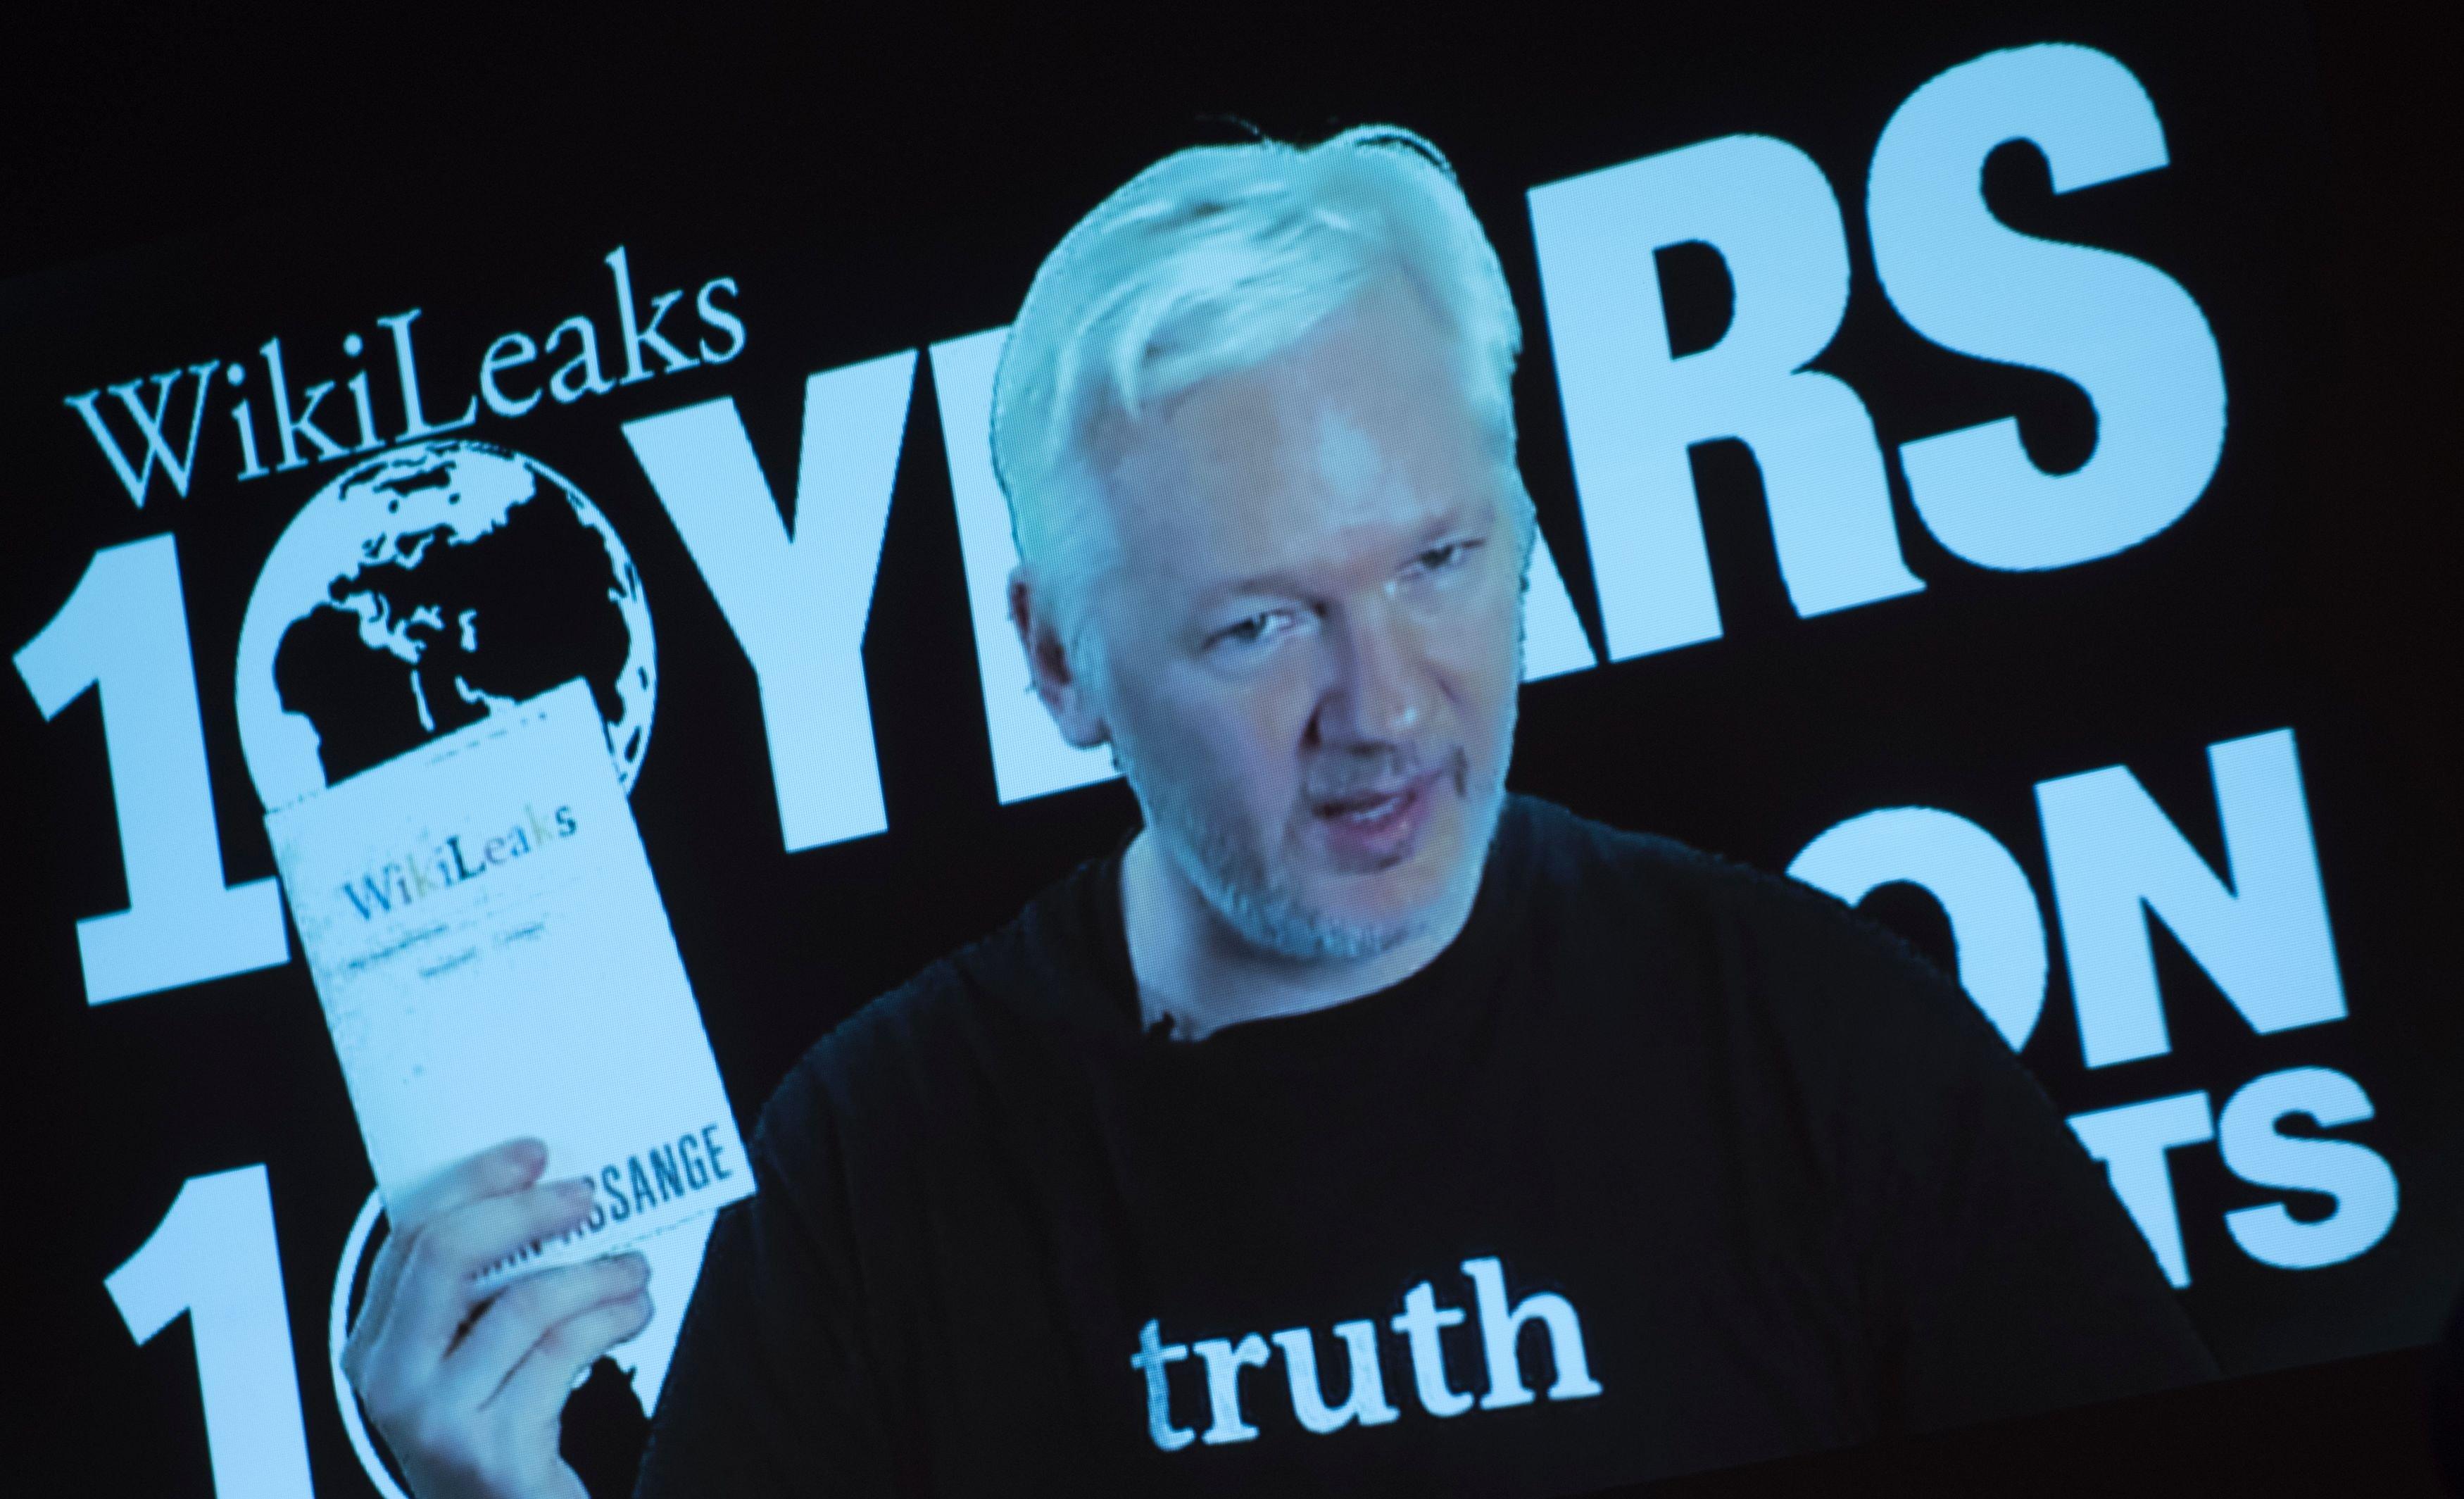 Zakladateľ WikiLeaks Julian Assange. (Foto: archív)